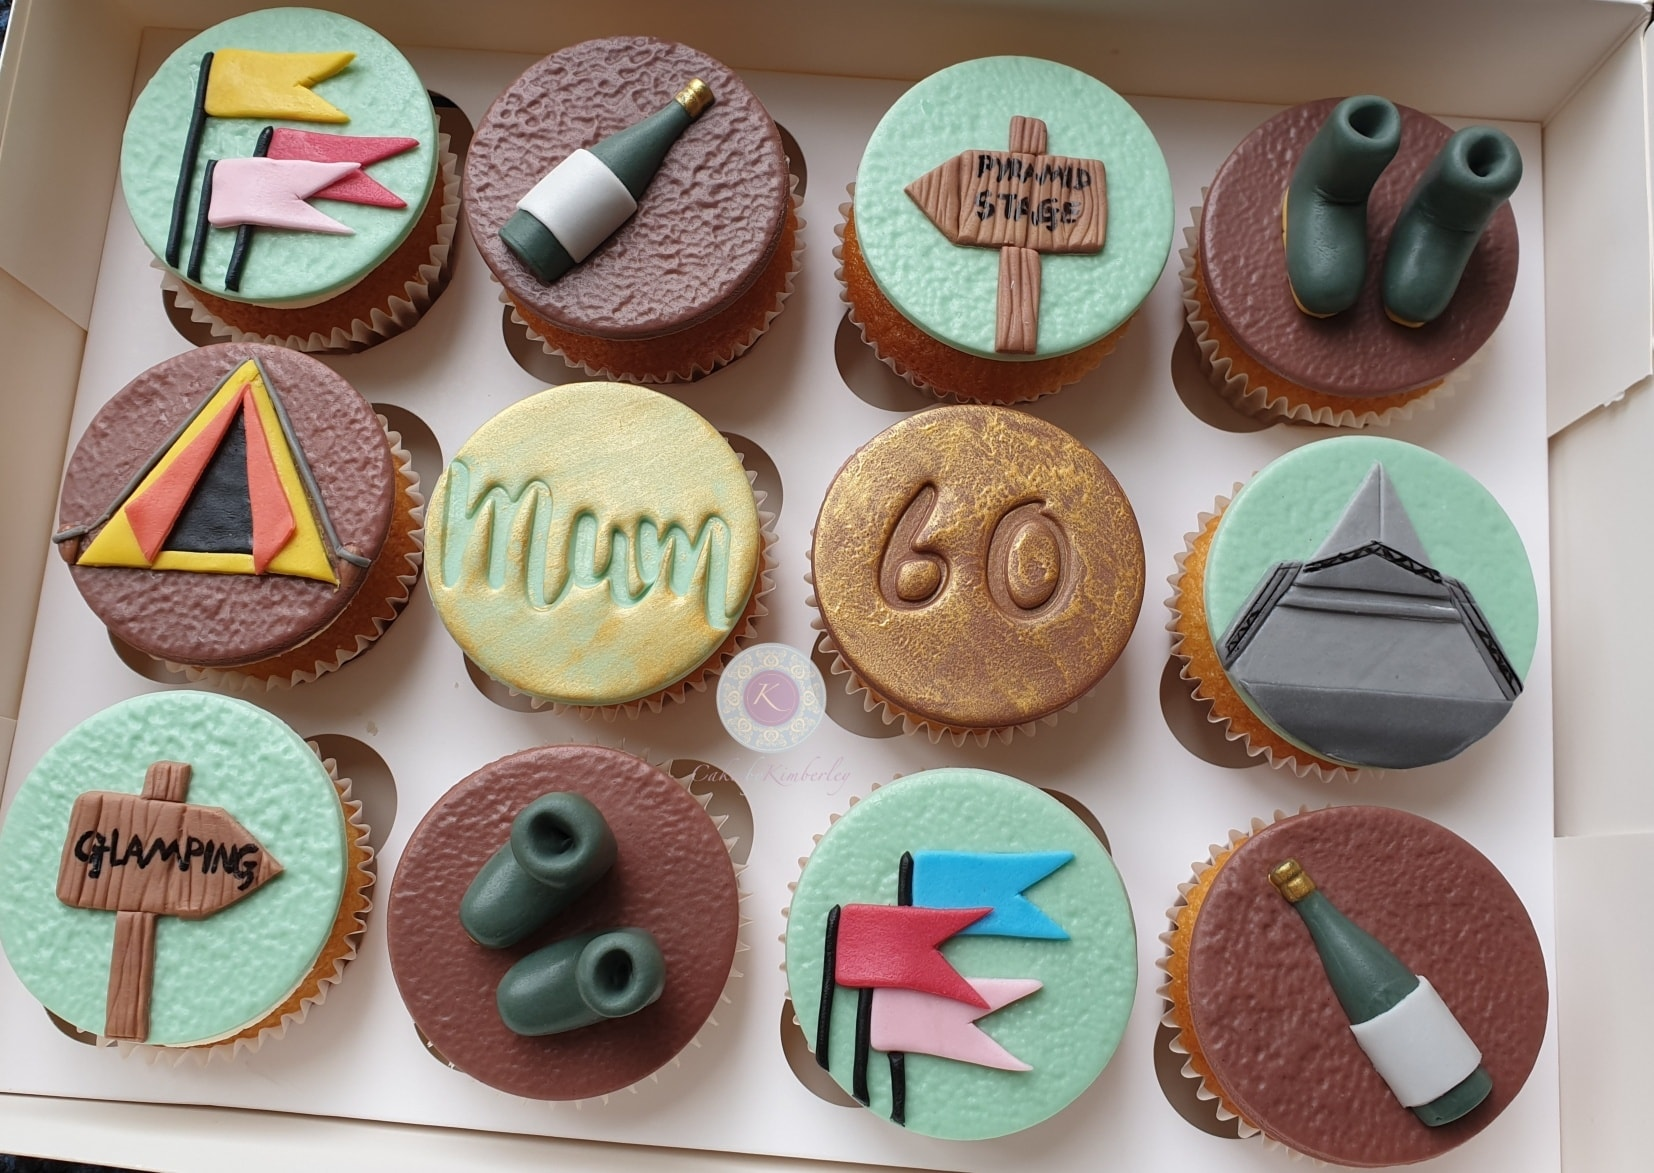 Cupcakes - Glastonbury 60th